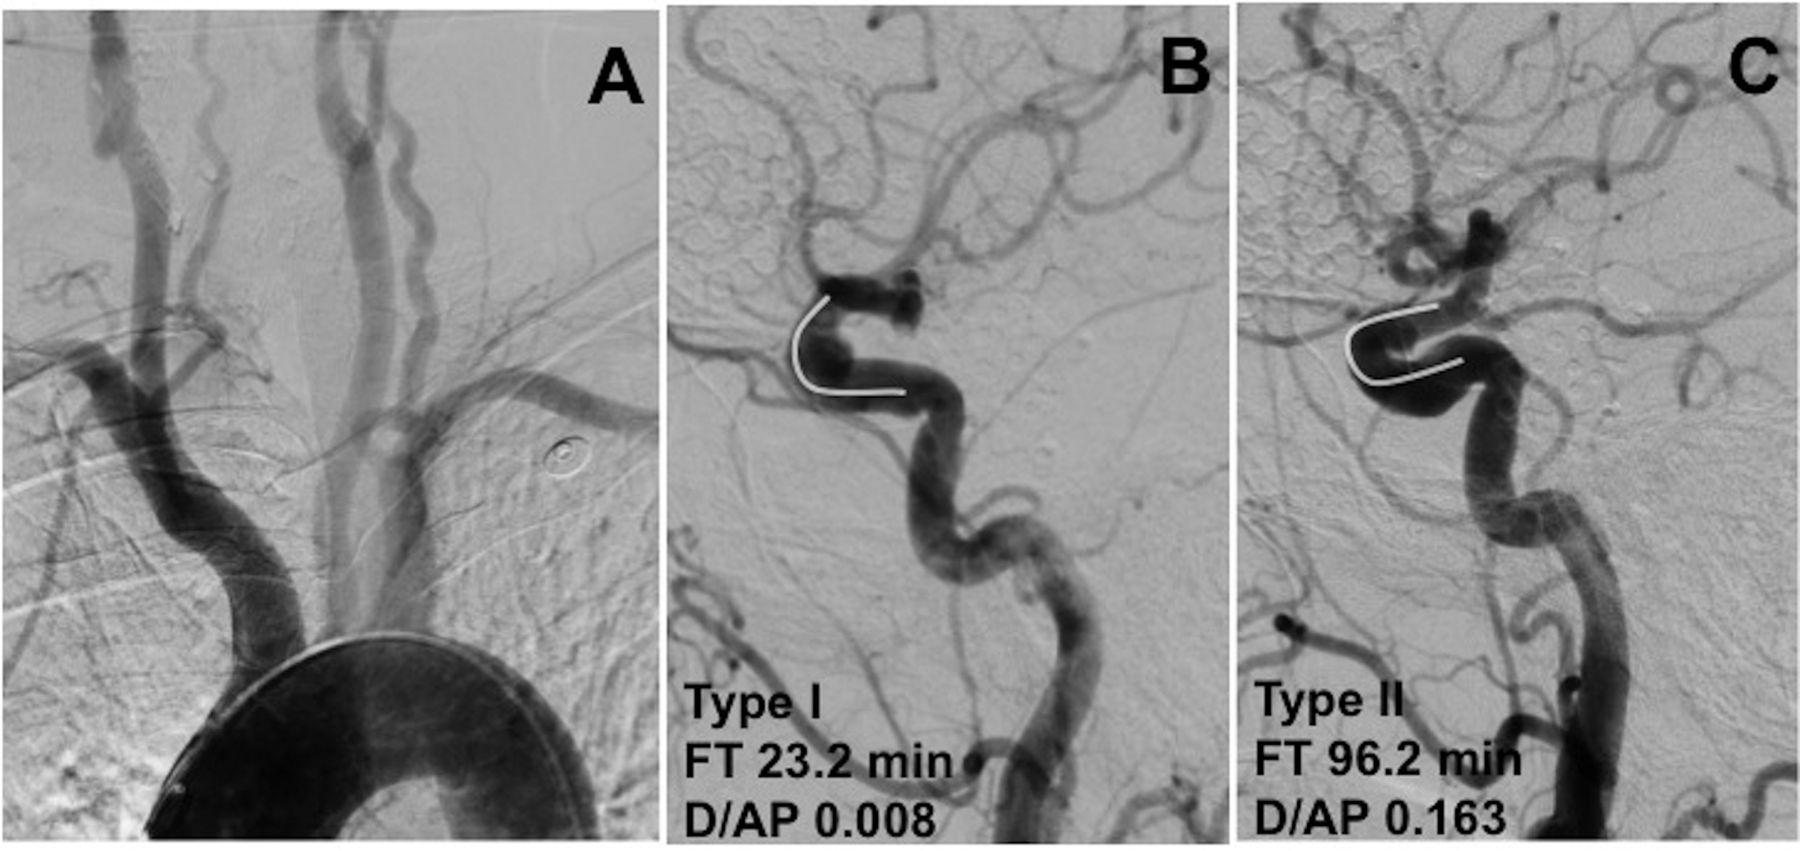 Classification of cavernous internal carotid artery